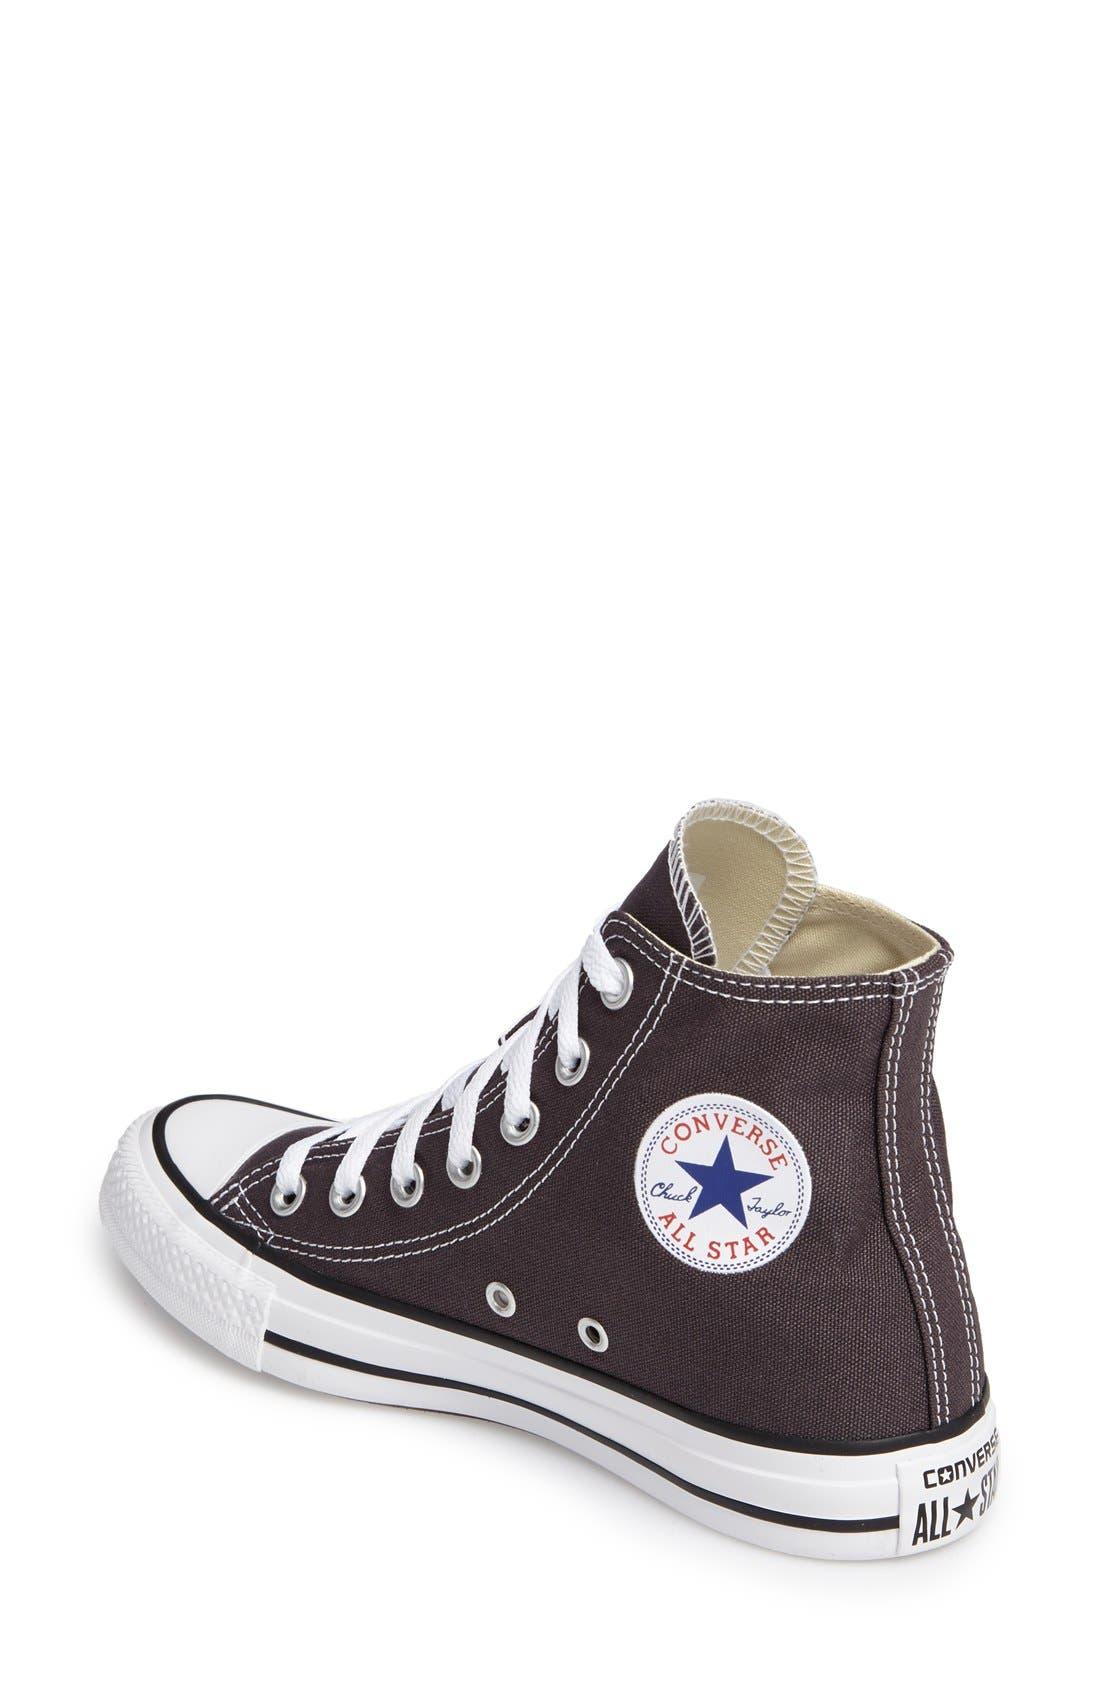 Alternate Image 2  - Converse Chuck Taylor® All Star® Seasonal High Top Sneaker (Women)